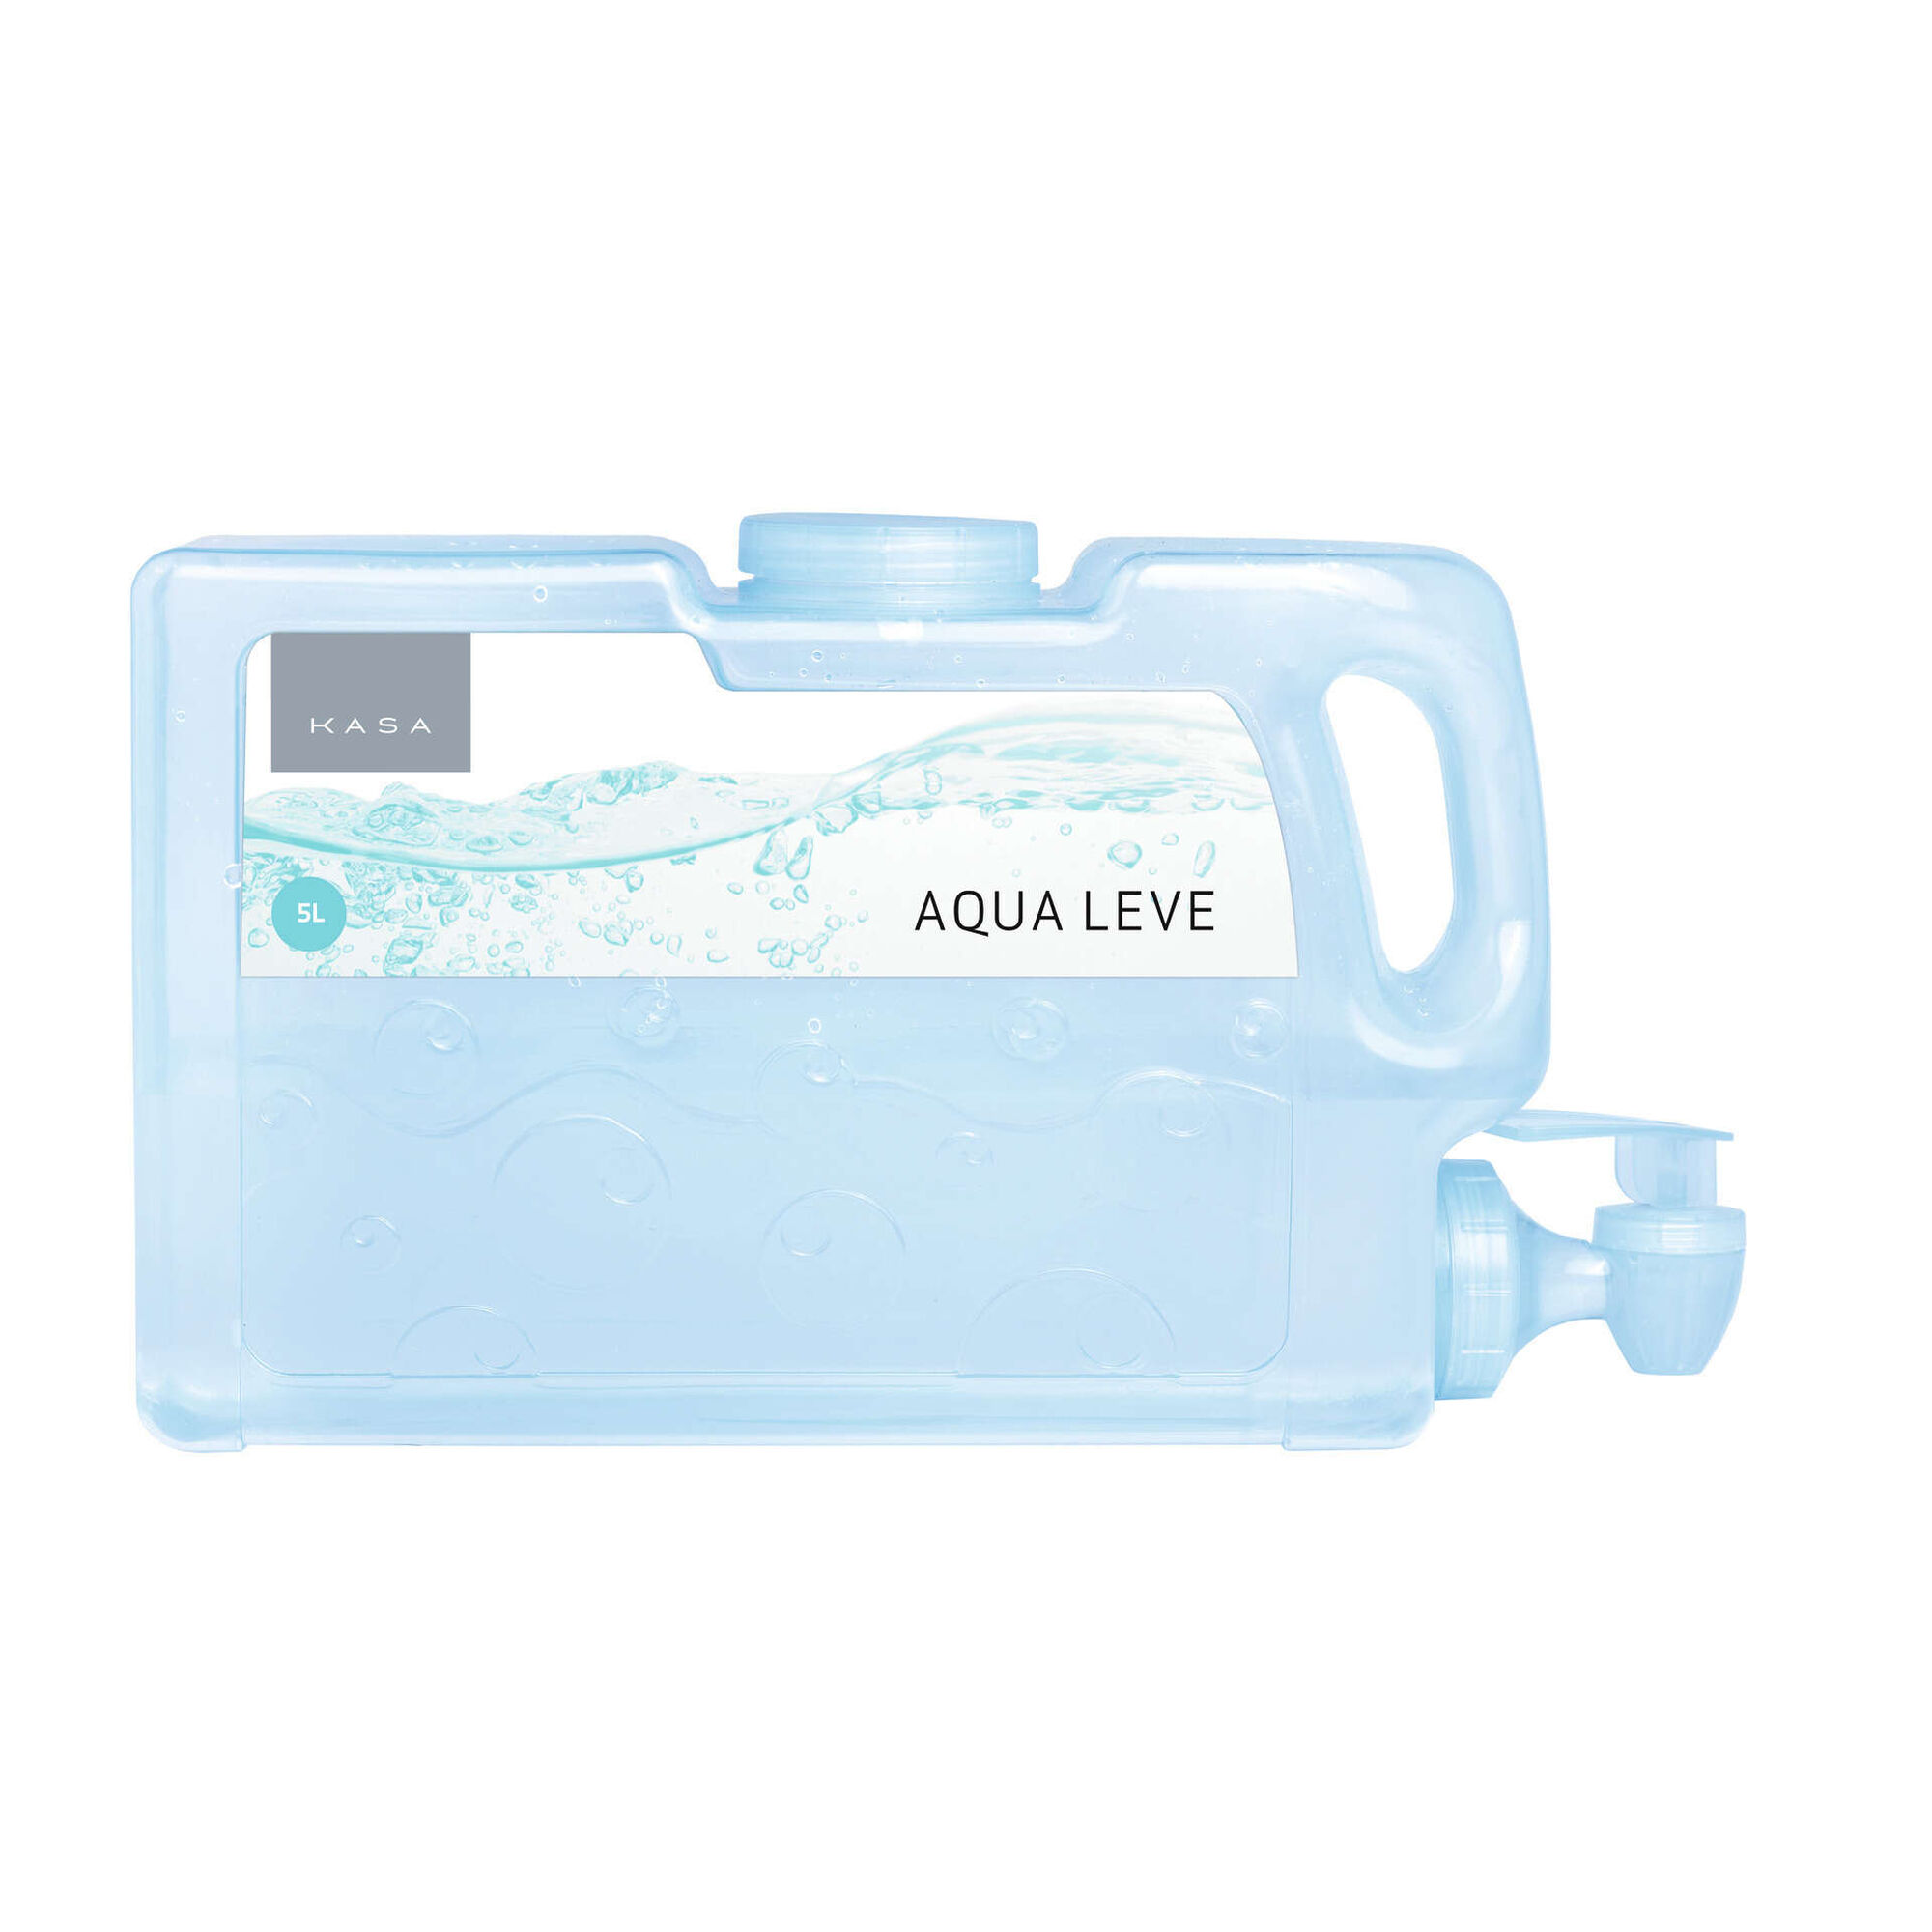 Contentor de Água Plástico para Frigorífico Azul Aqua Leve